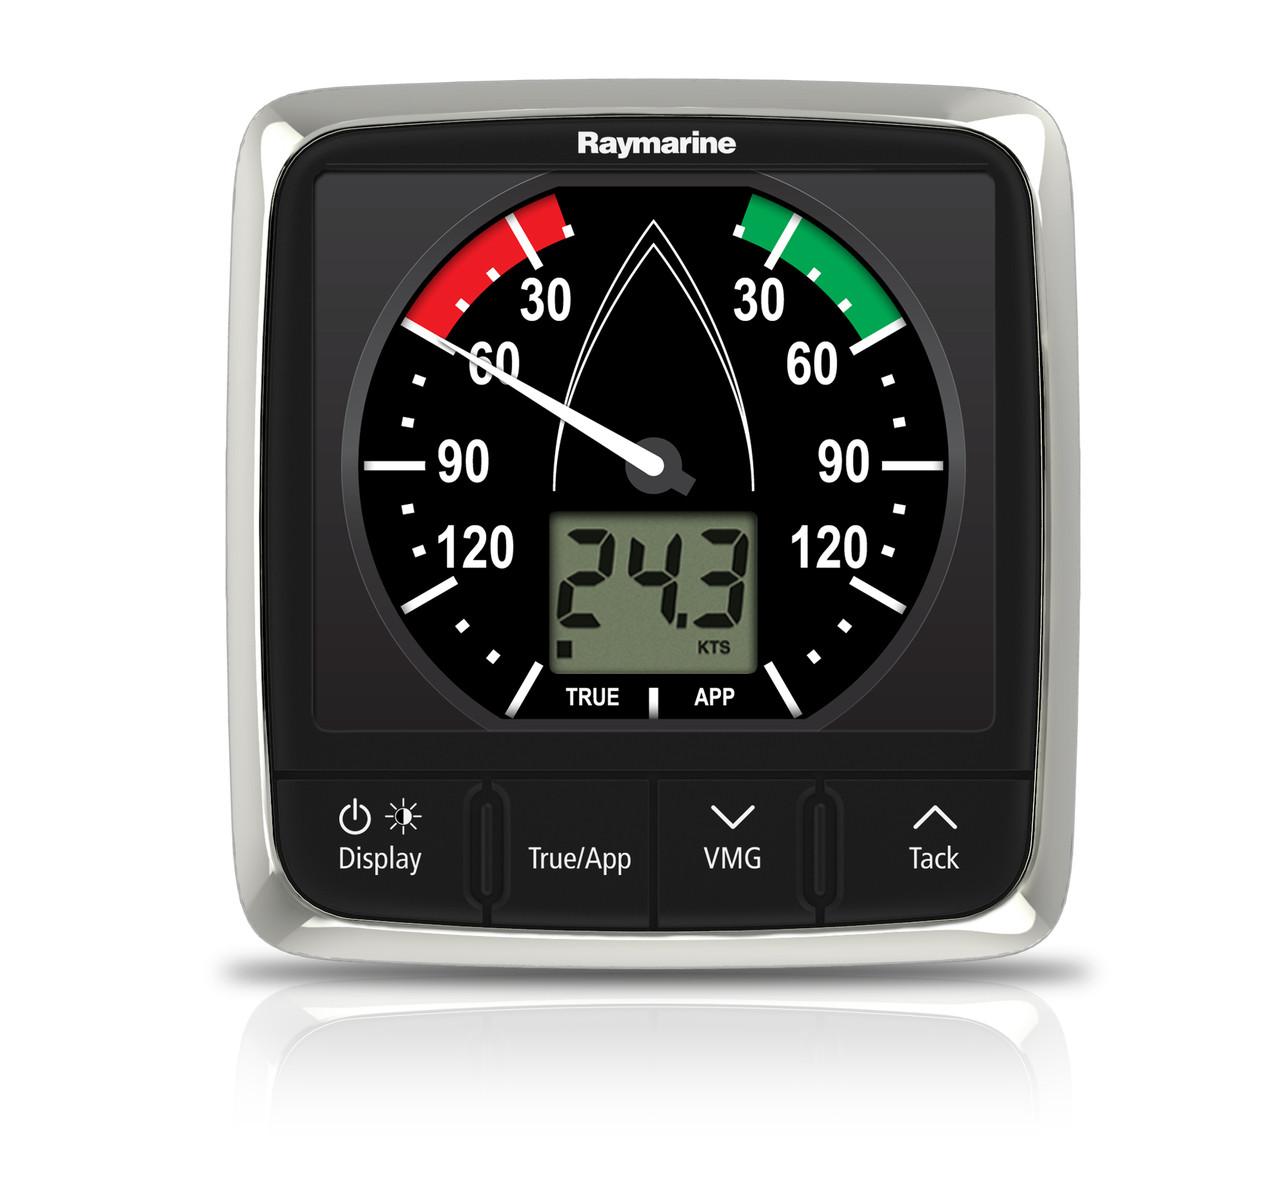 Raymarine i60 Wind Instrument Display Analogue